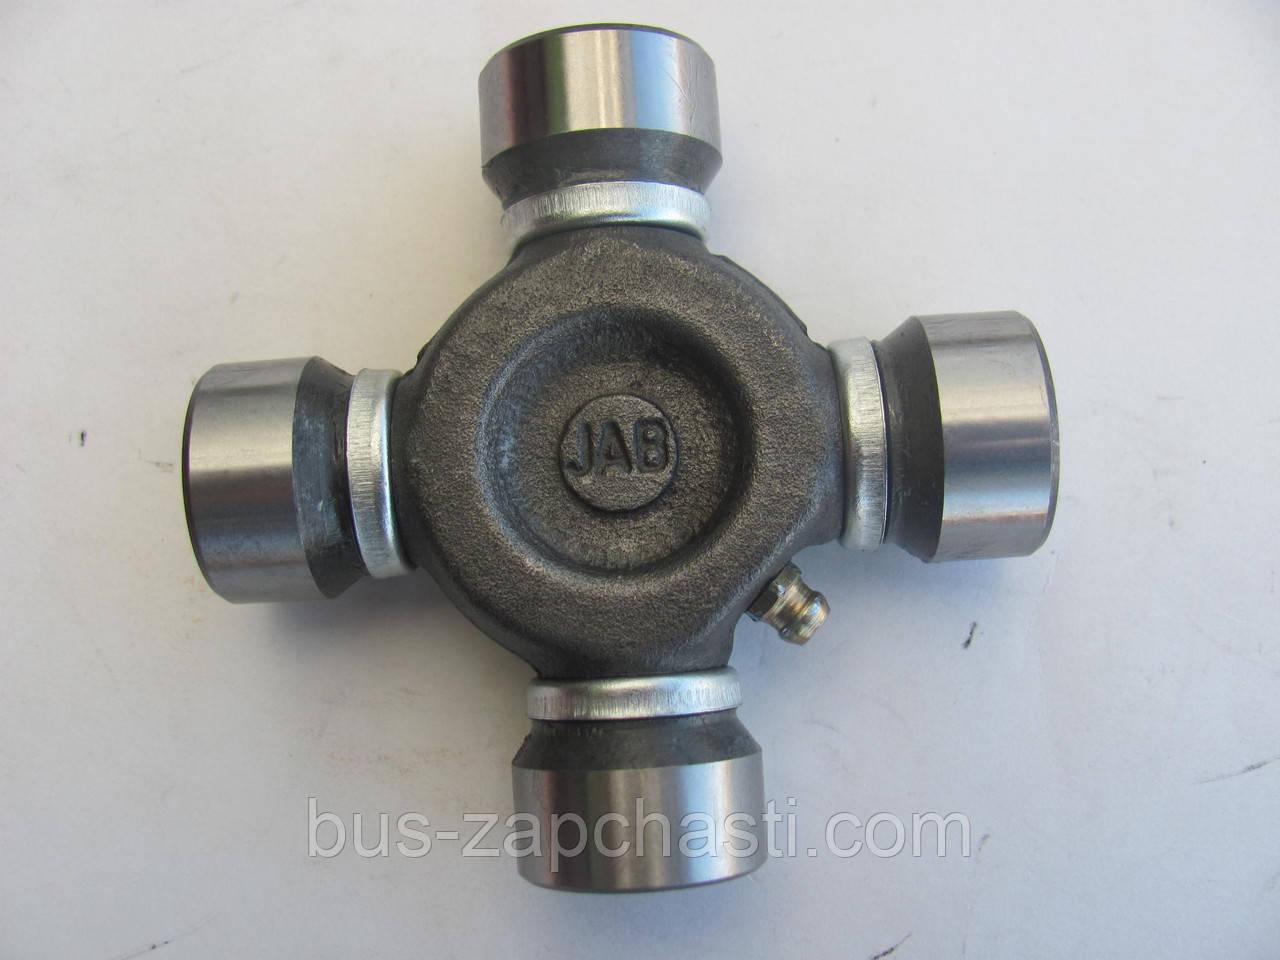 Крестовина кардана (27×88) на MB Sprinter 906, VW Crafter 2006→ — JAB (Польша) — KM-08